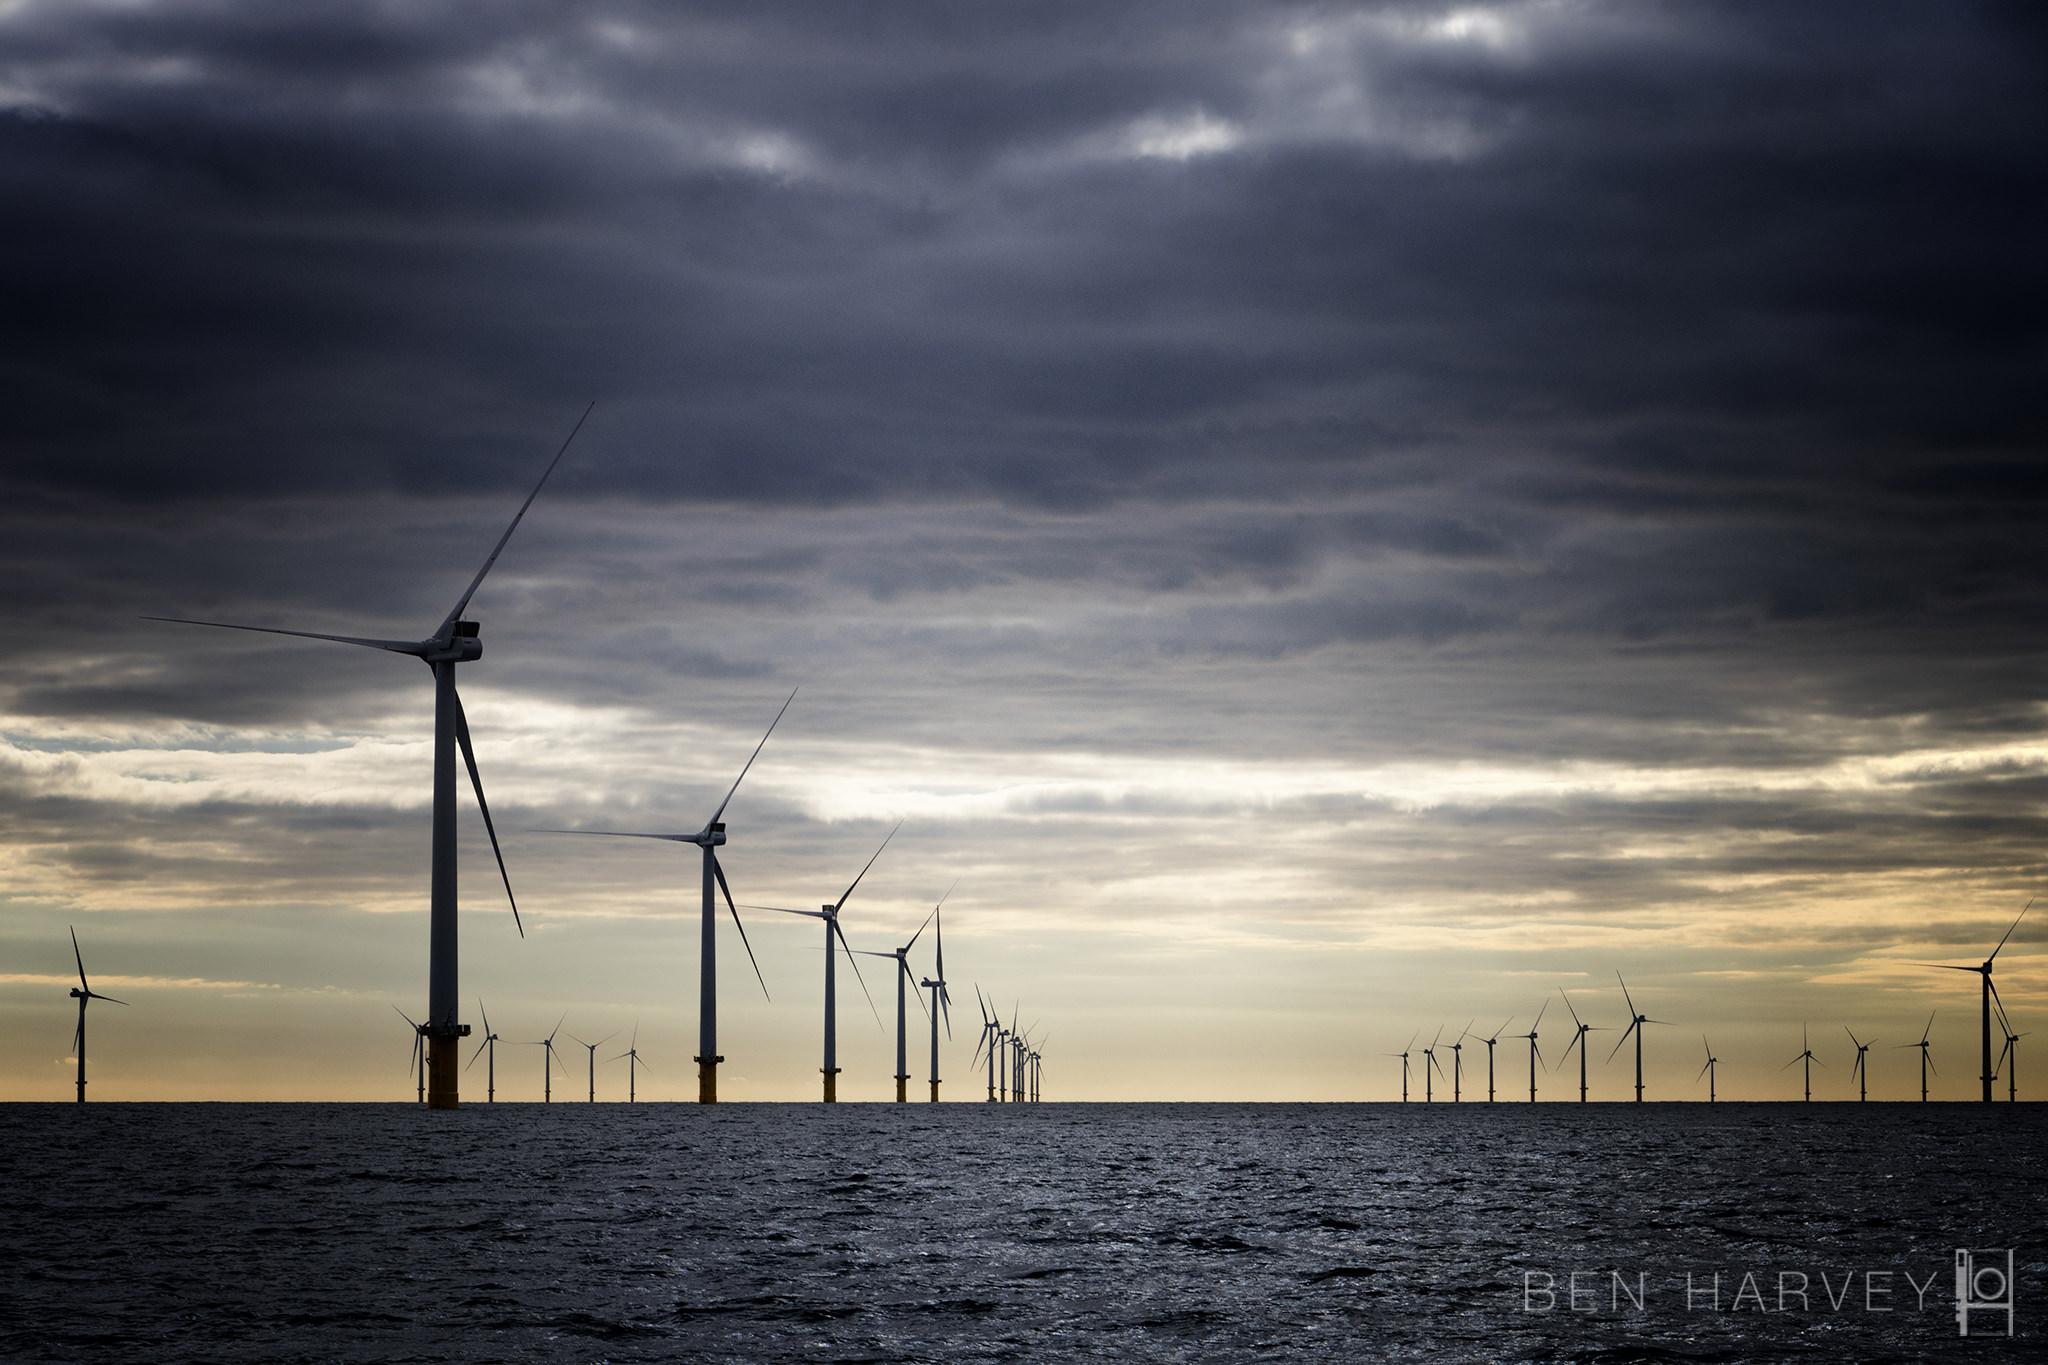 Approach to windfarm